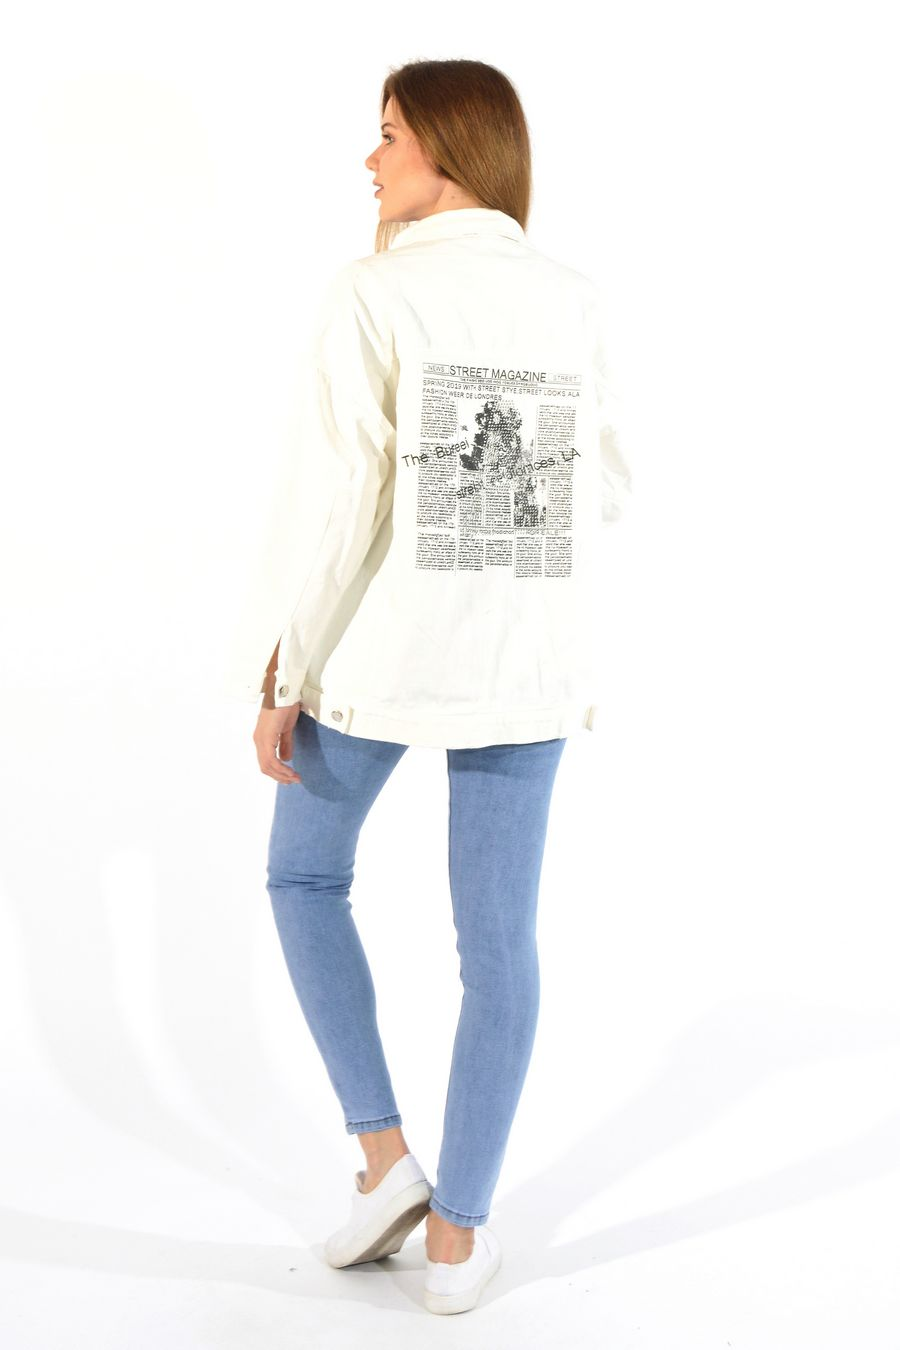 Жакет женский (джинсовка) LRZBS 955 - фото 2